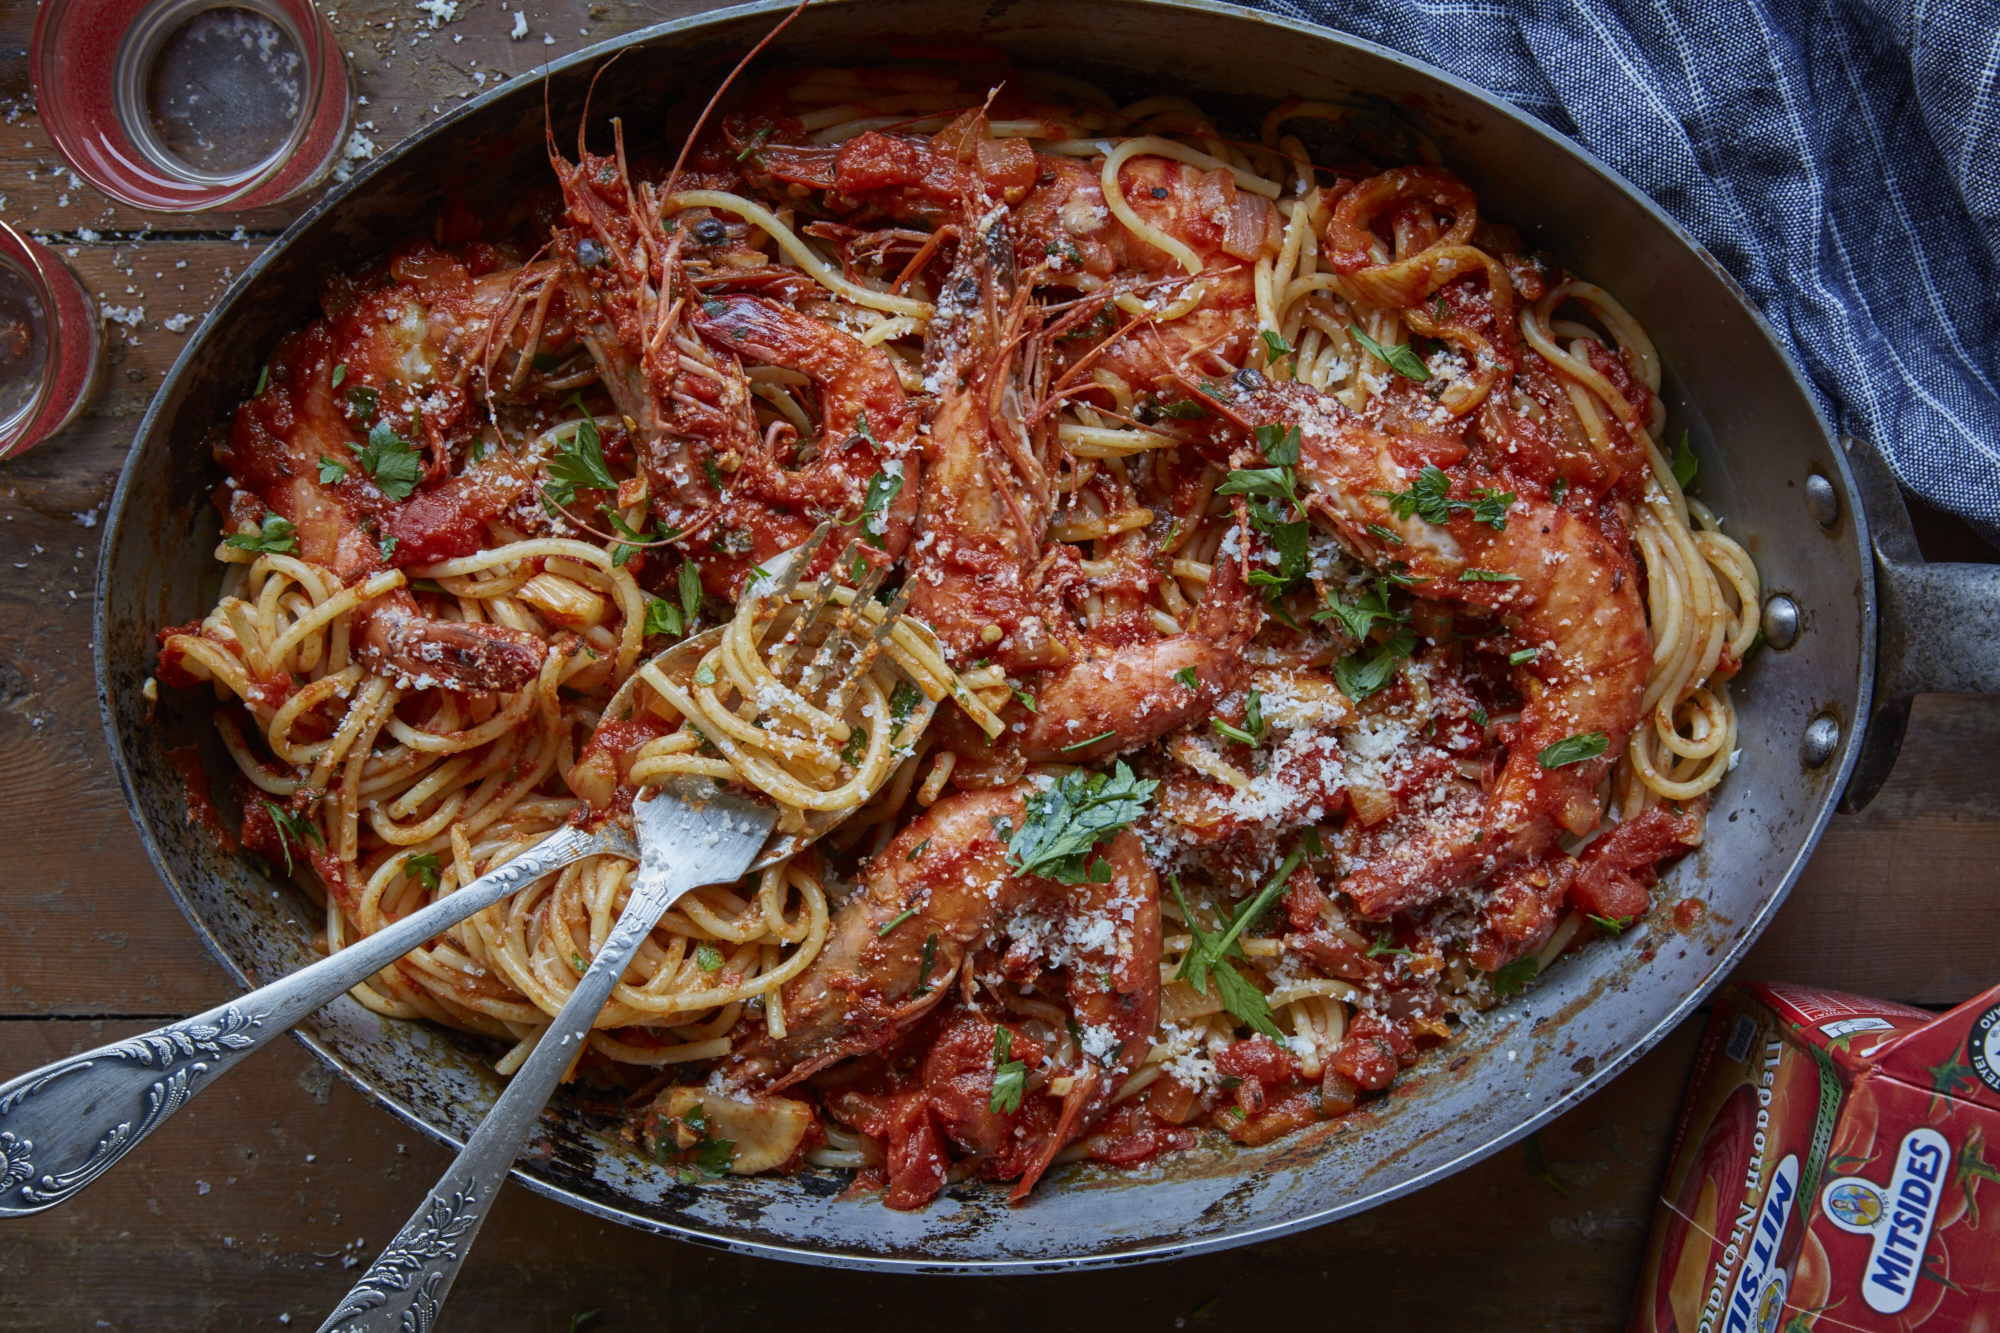 Mitsides Ouzo Spaghetti Mitsides - Prawn Ouzo Spaghetti1132